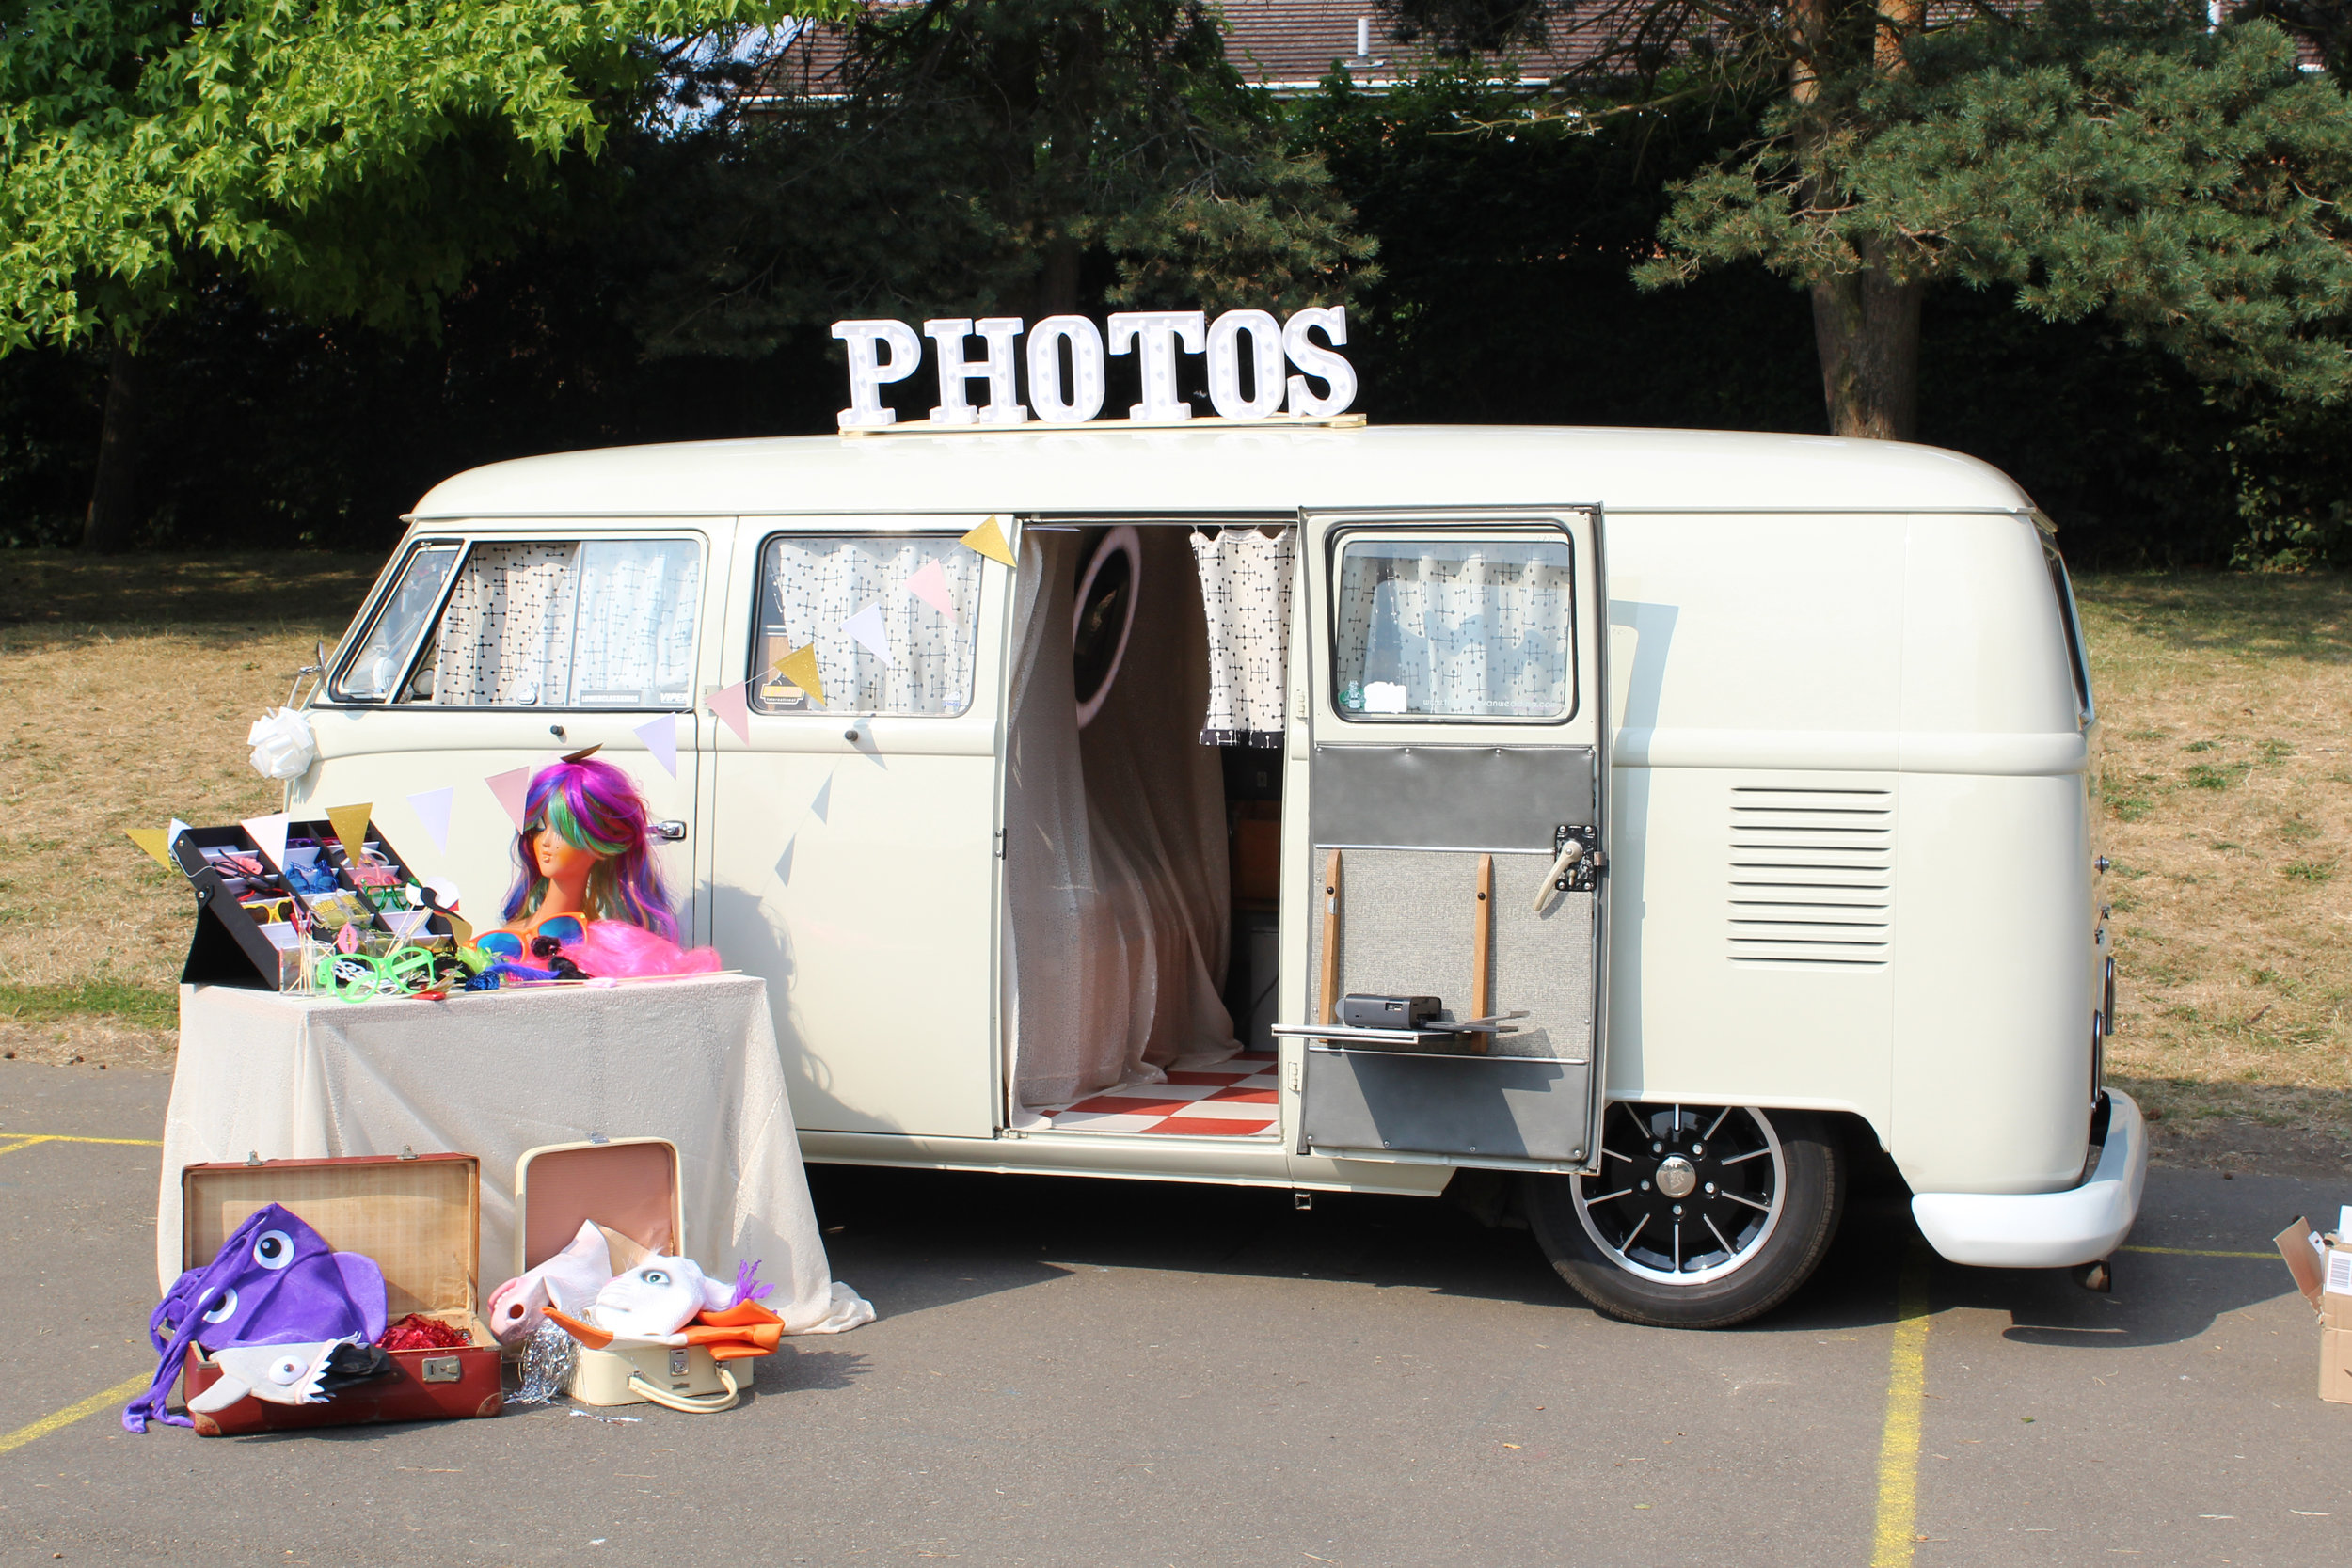 photo-booth-rochester.jpg